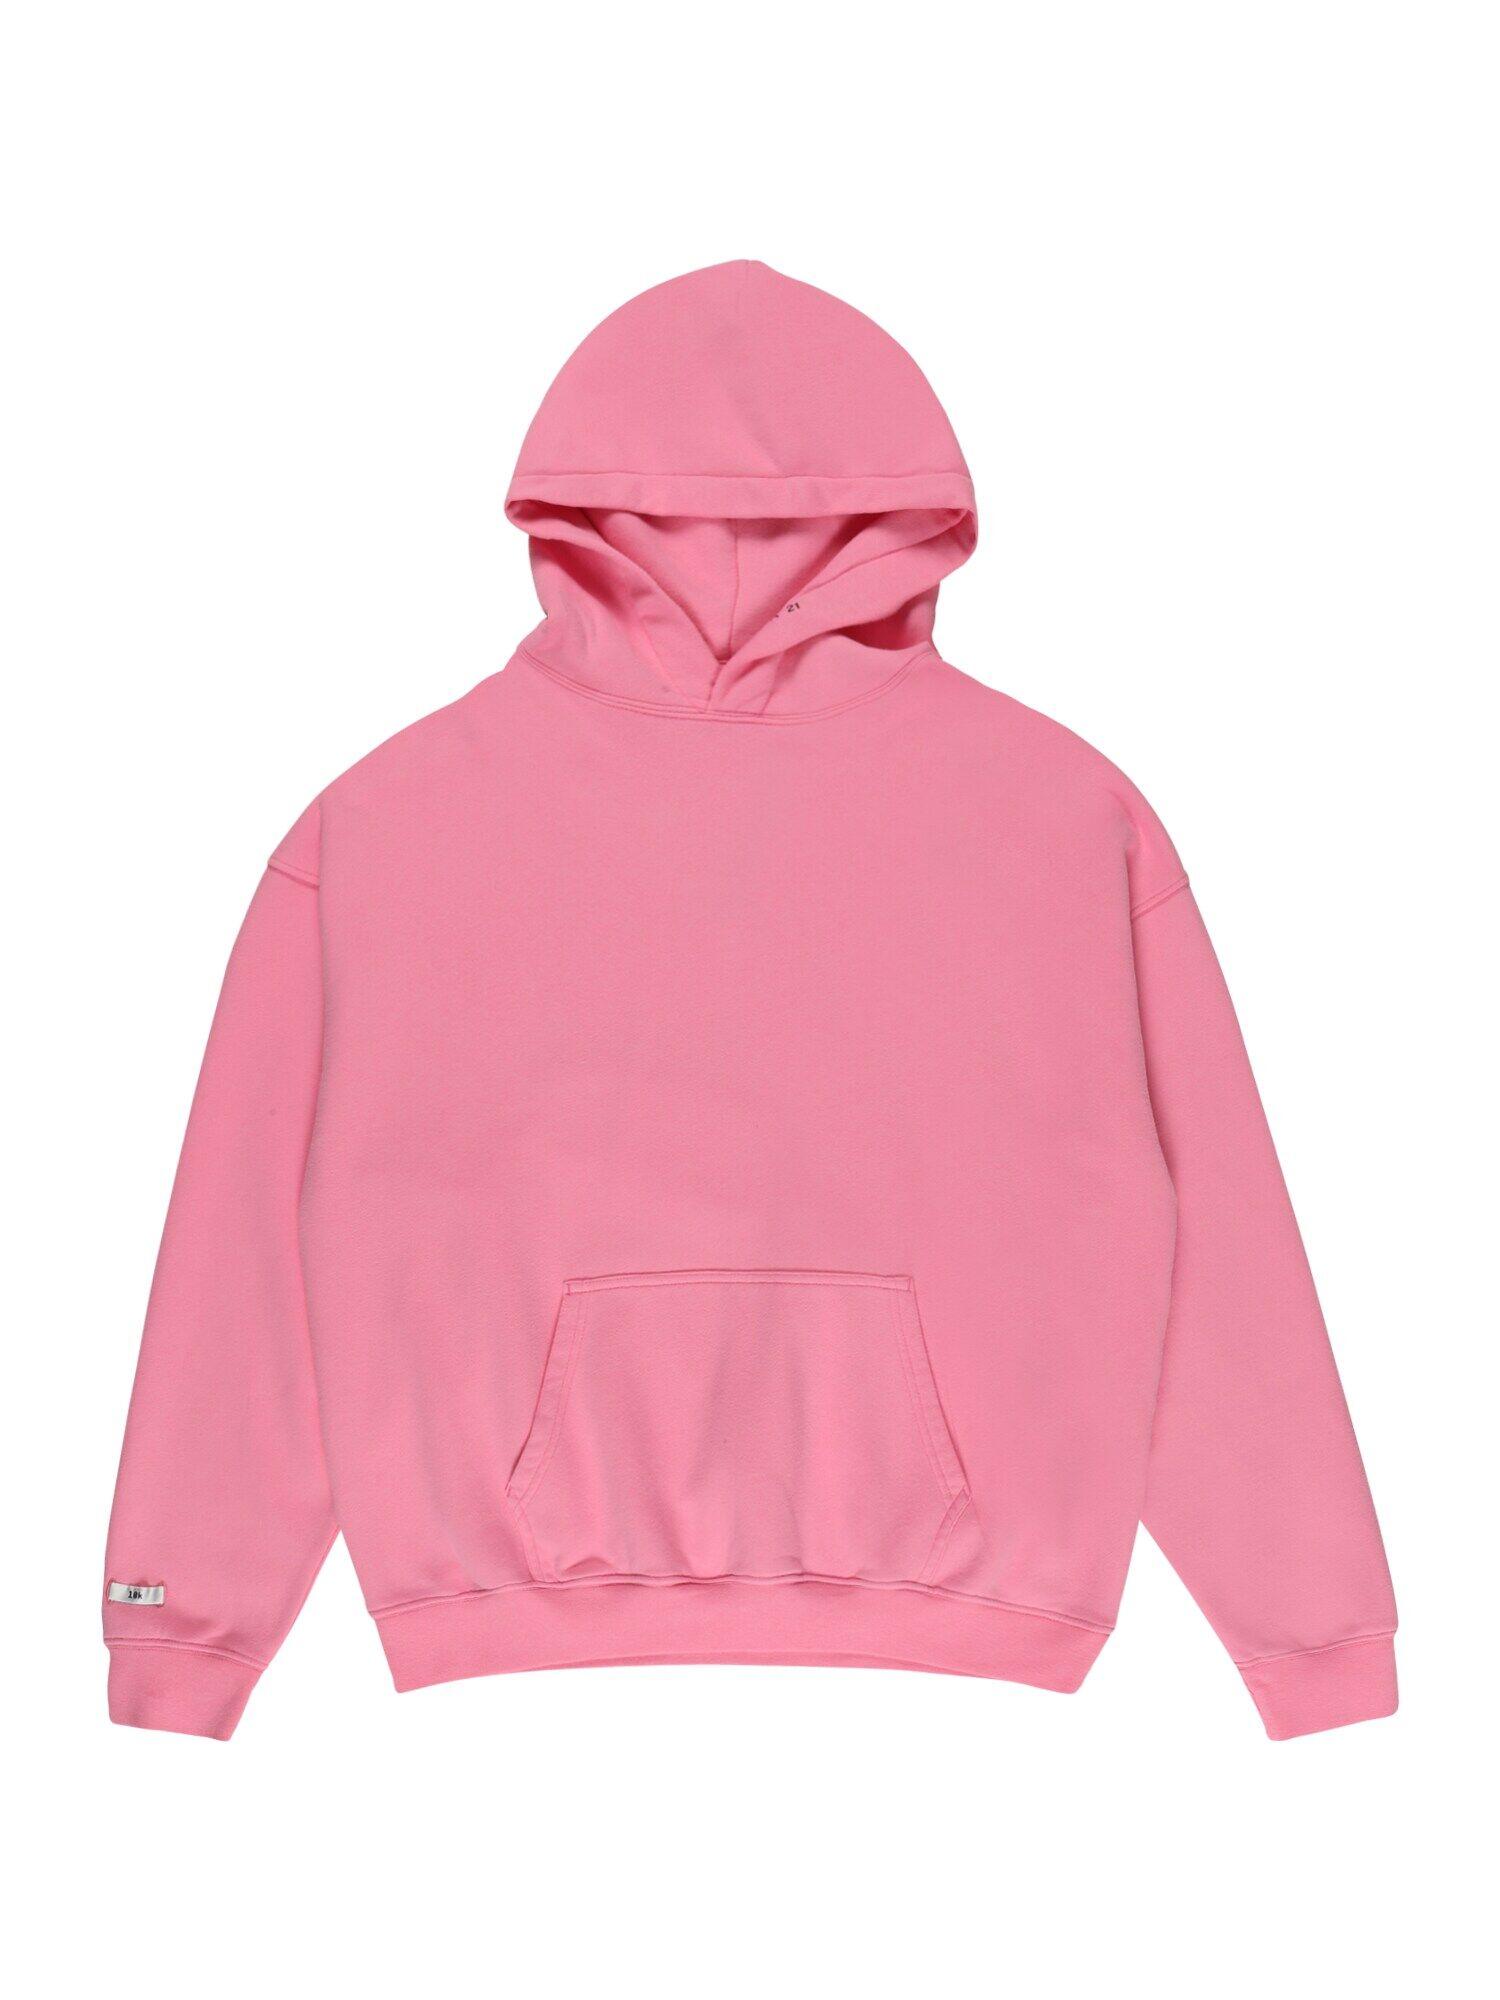 10k Sweat-shirt  - Rose - Taille: XL - male